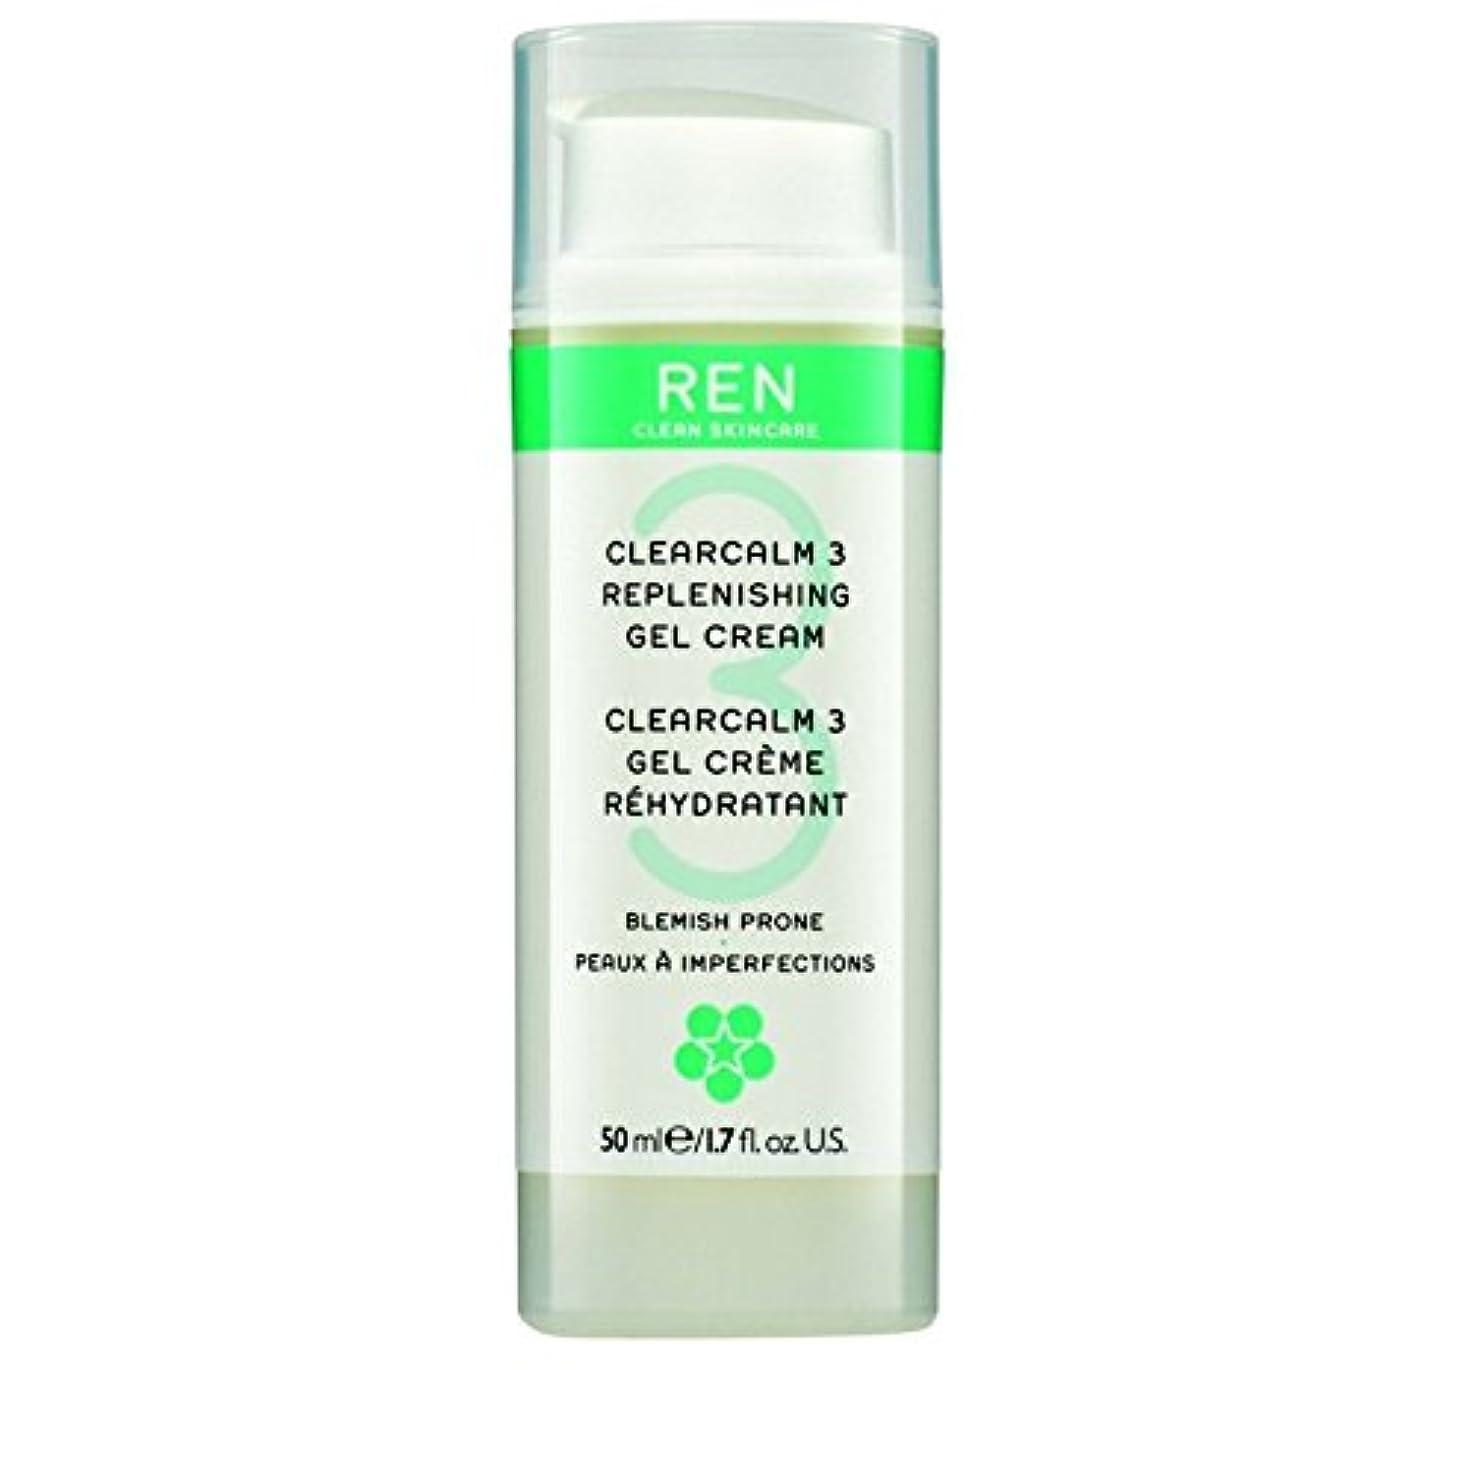 3補給夜の血清 x4 - REN ClearCalm 3 Replenishing Night Serum (Pack of 4) [並行輸入品]